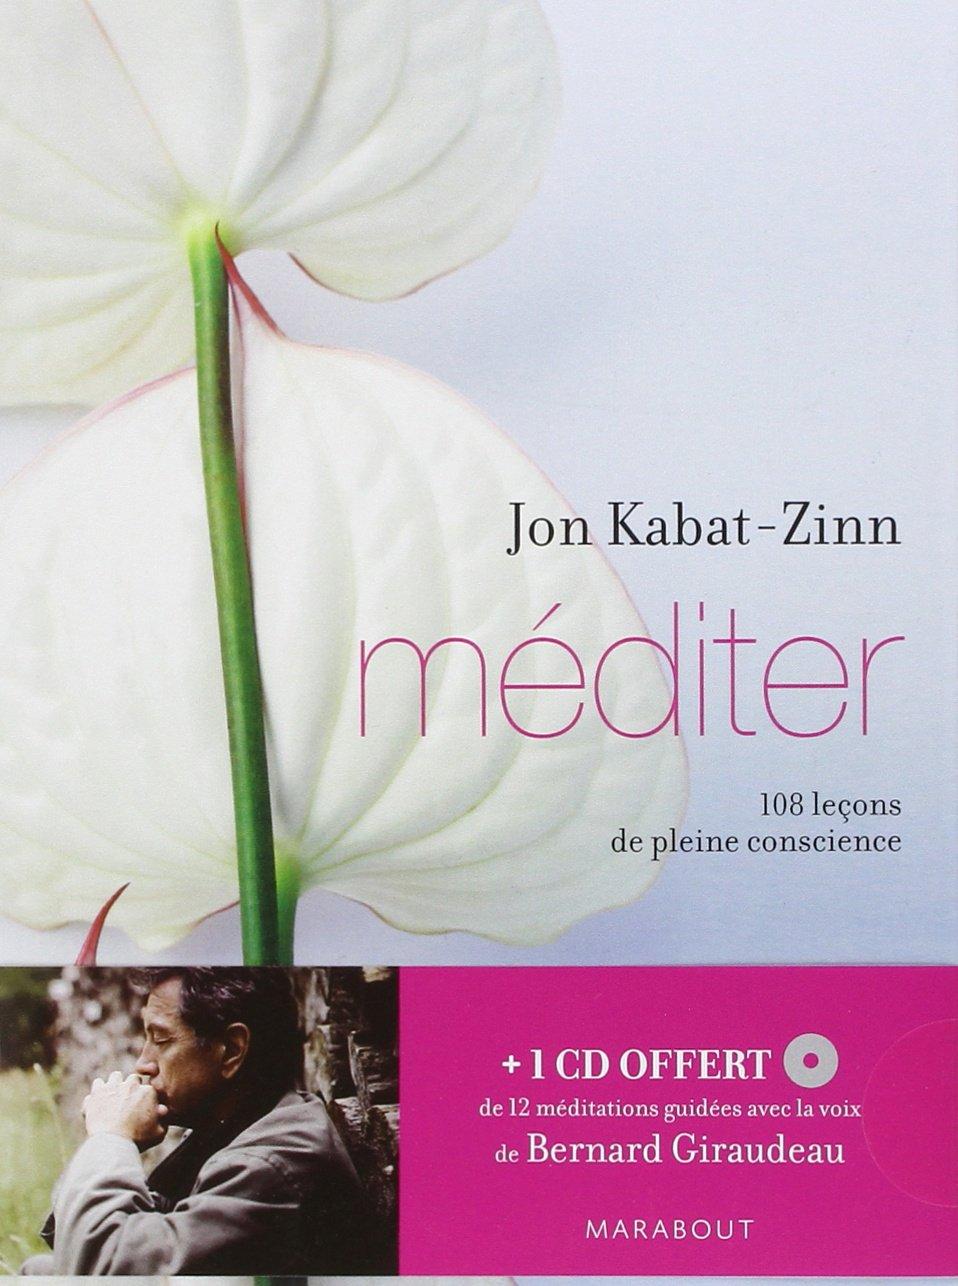 Méditer - 108 leçons de pleine conscience - Jon Kabat-Zinn - Editions Marabout